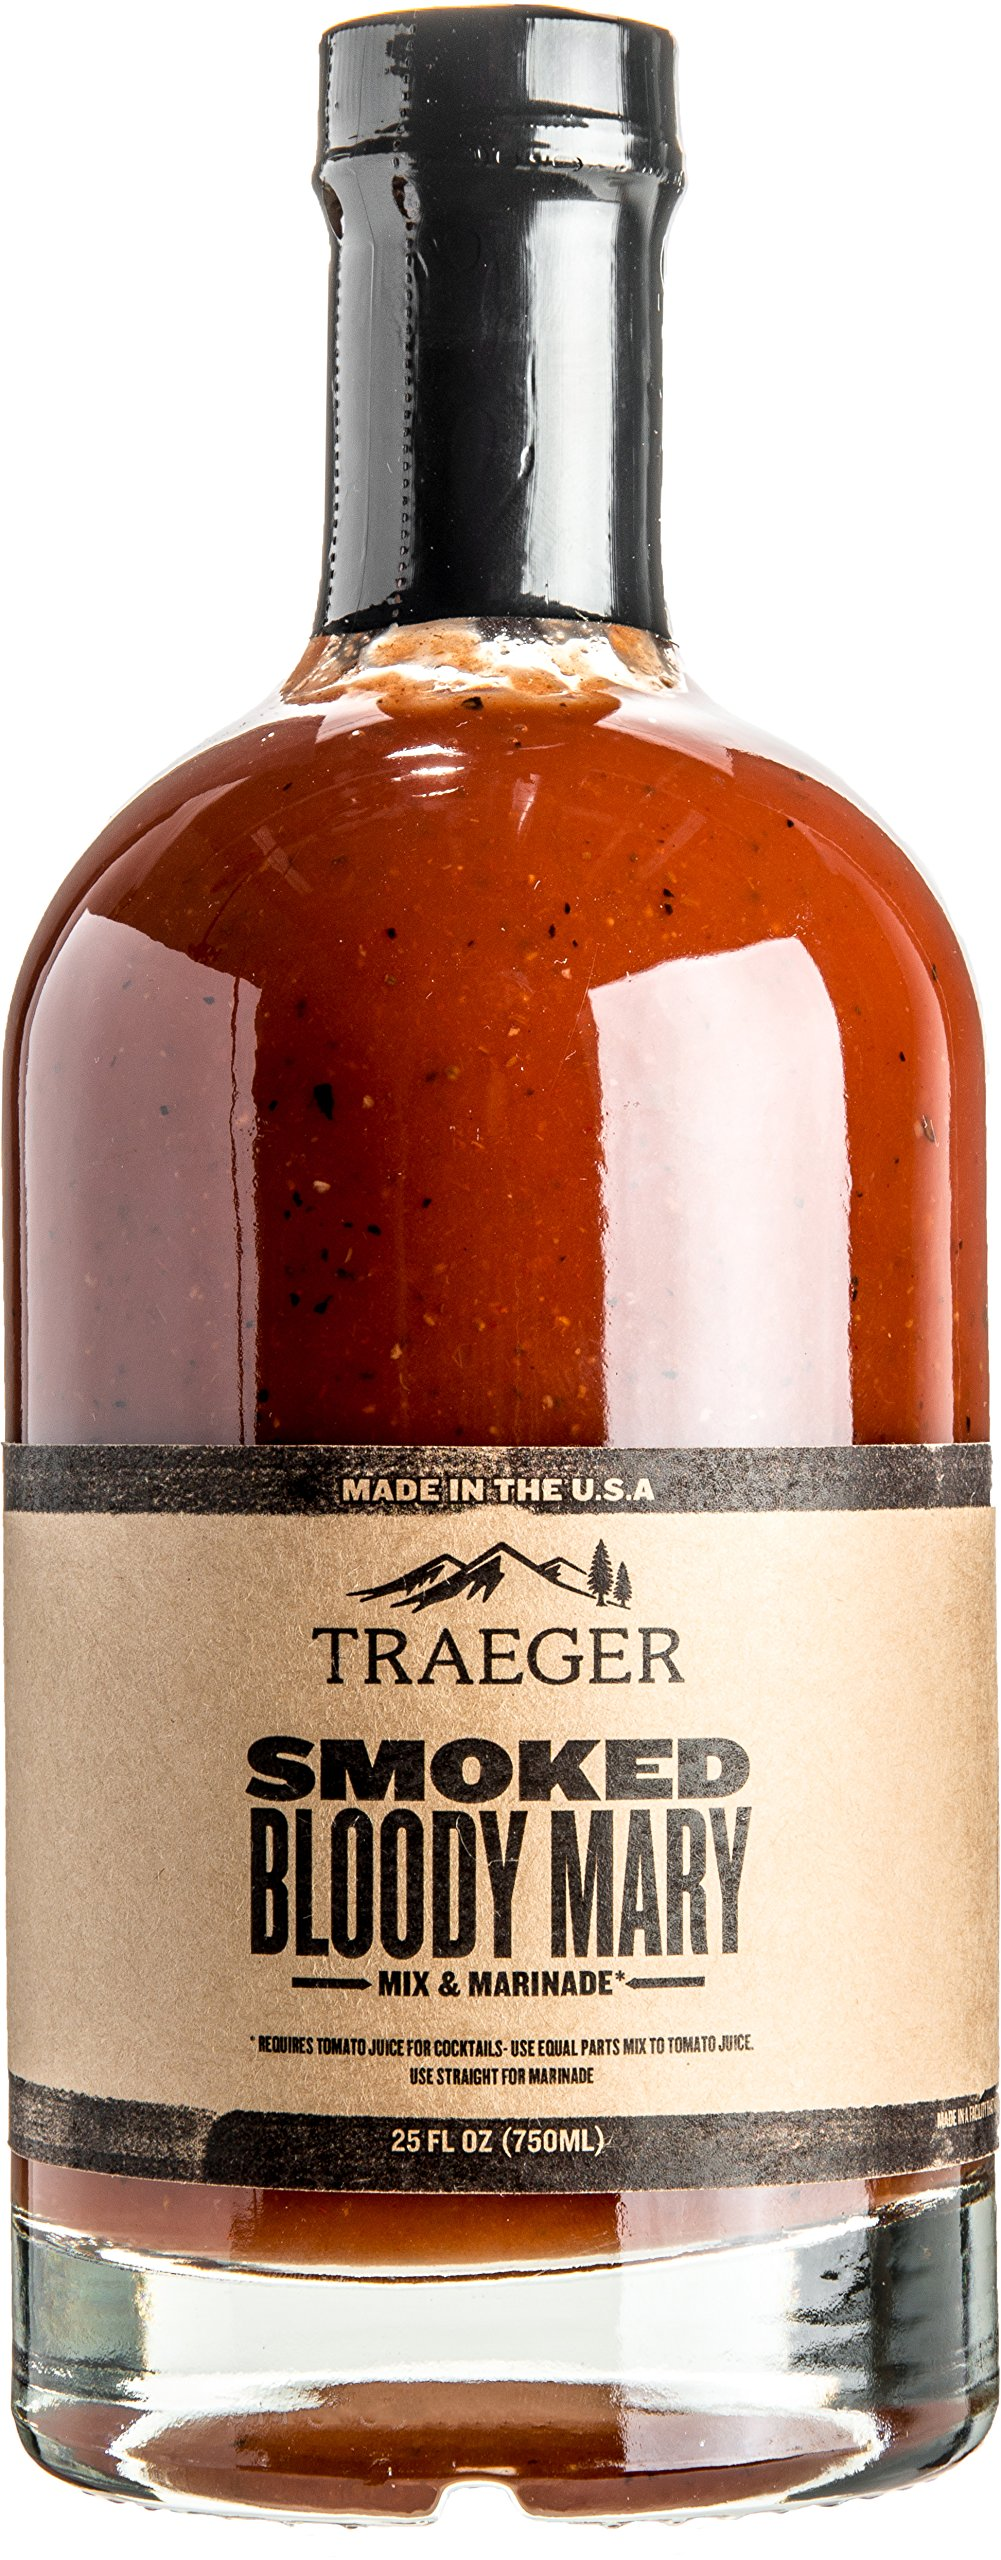 Traeger MIX002 Smoked Bloody Mary Mix